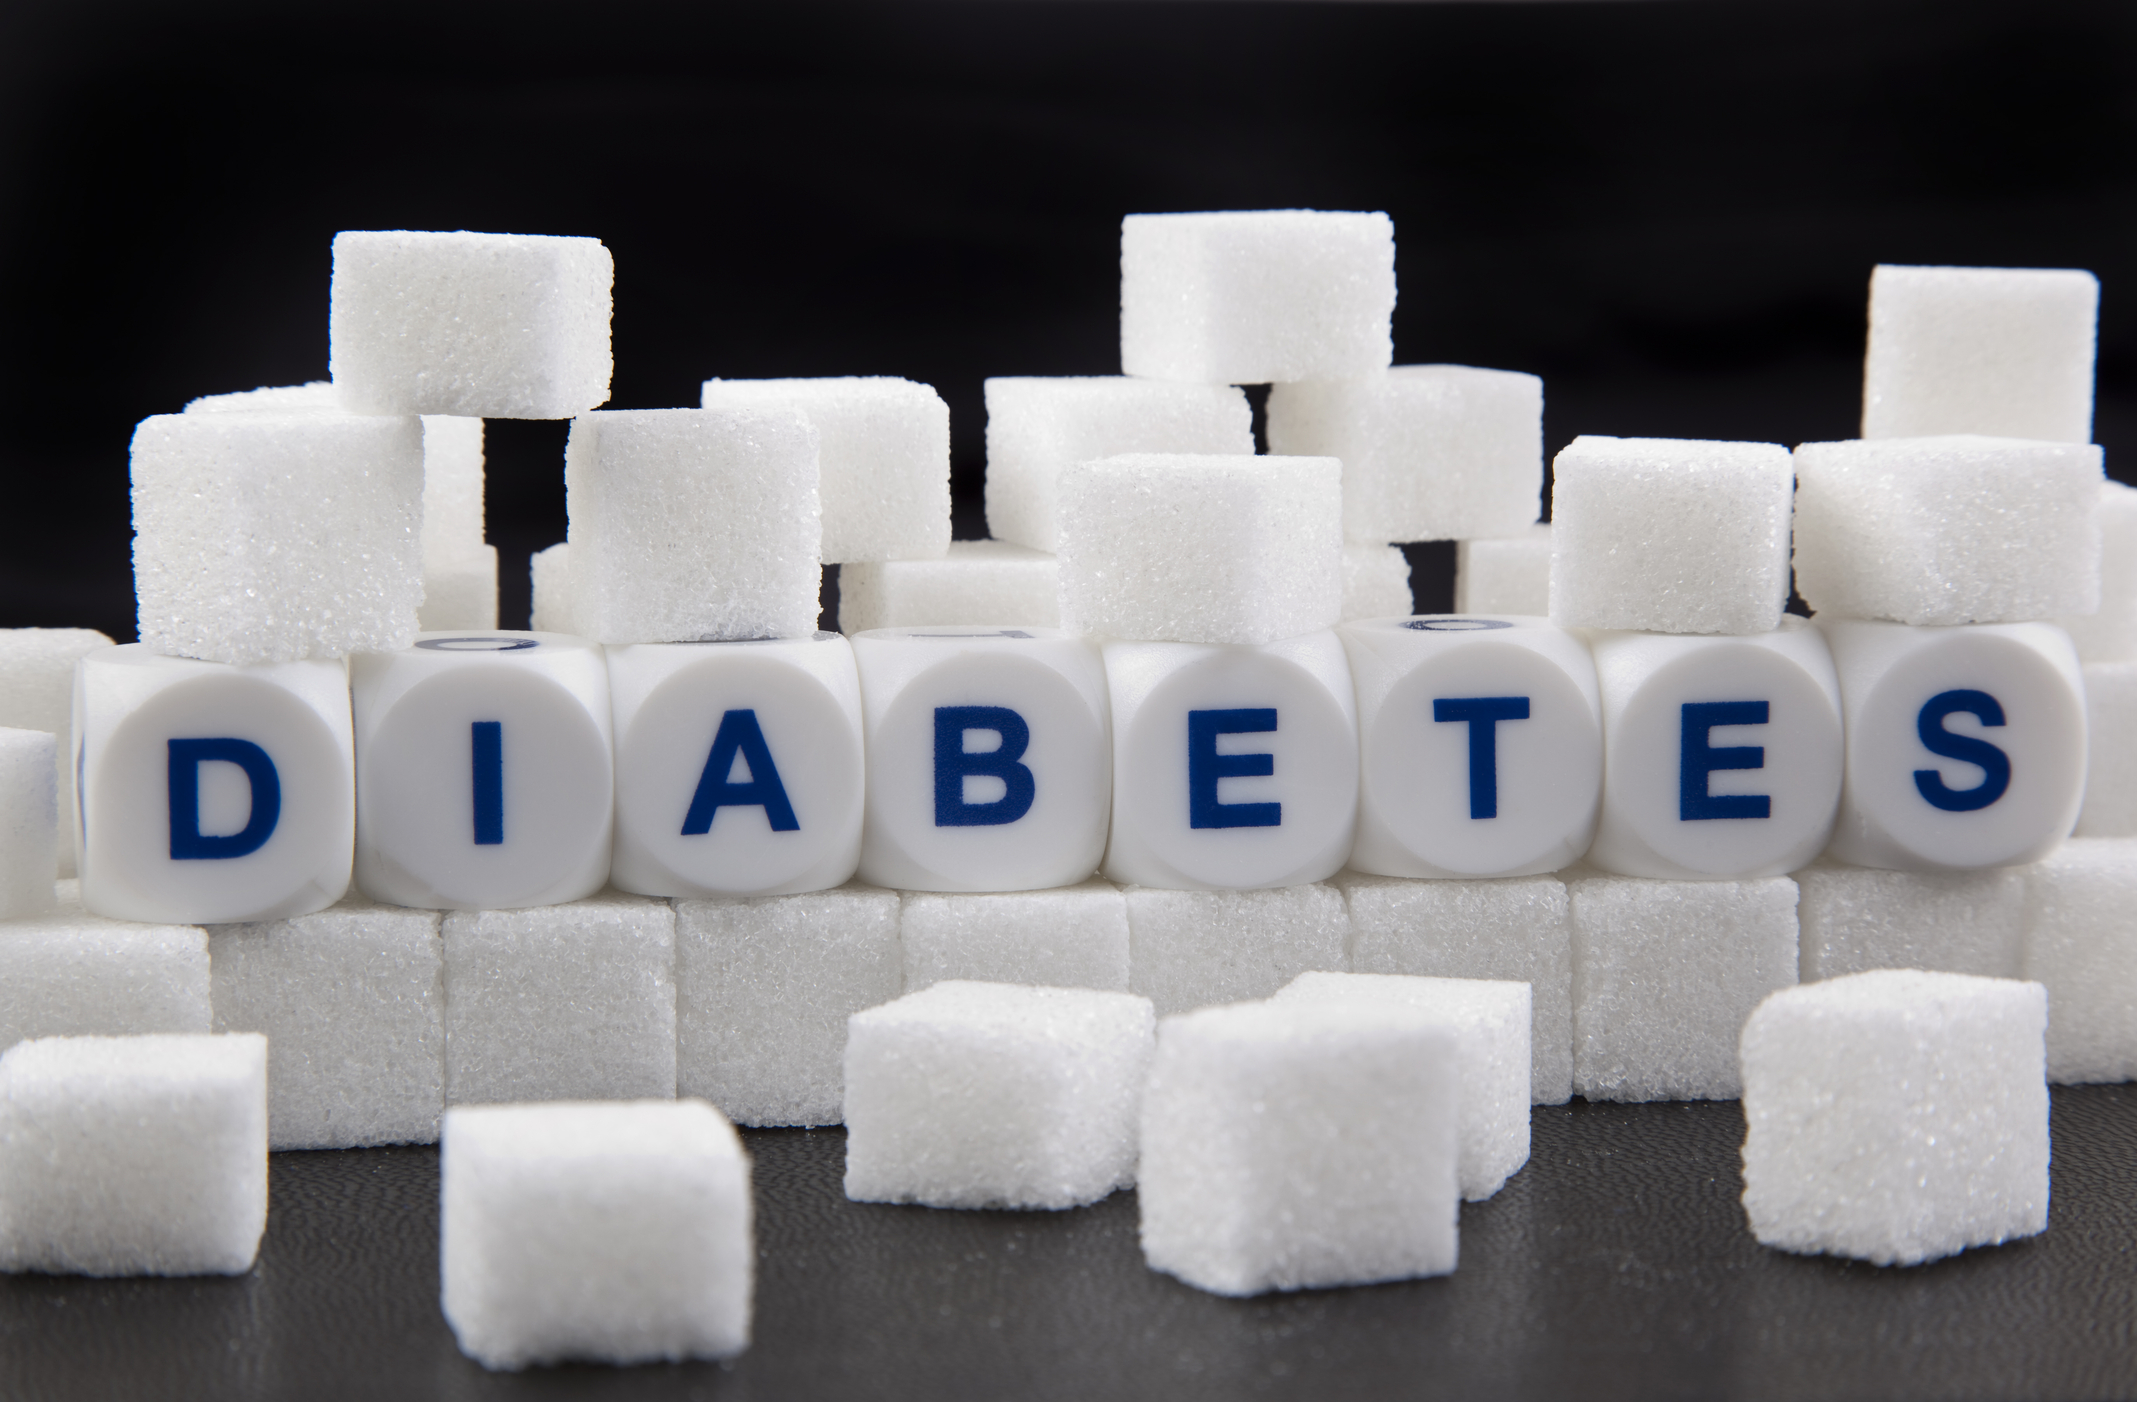 A Natural Diabetes Treatment That Works!